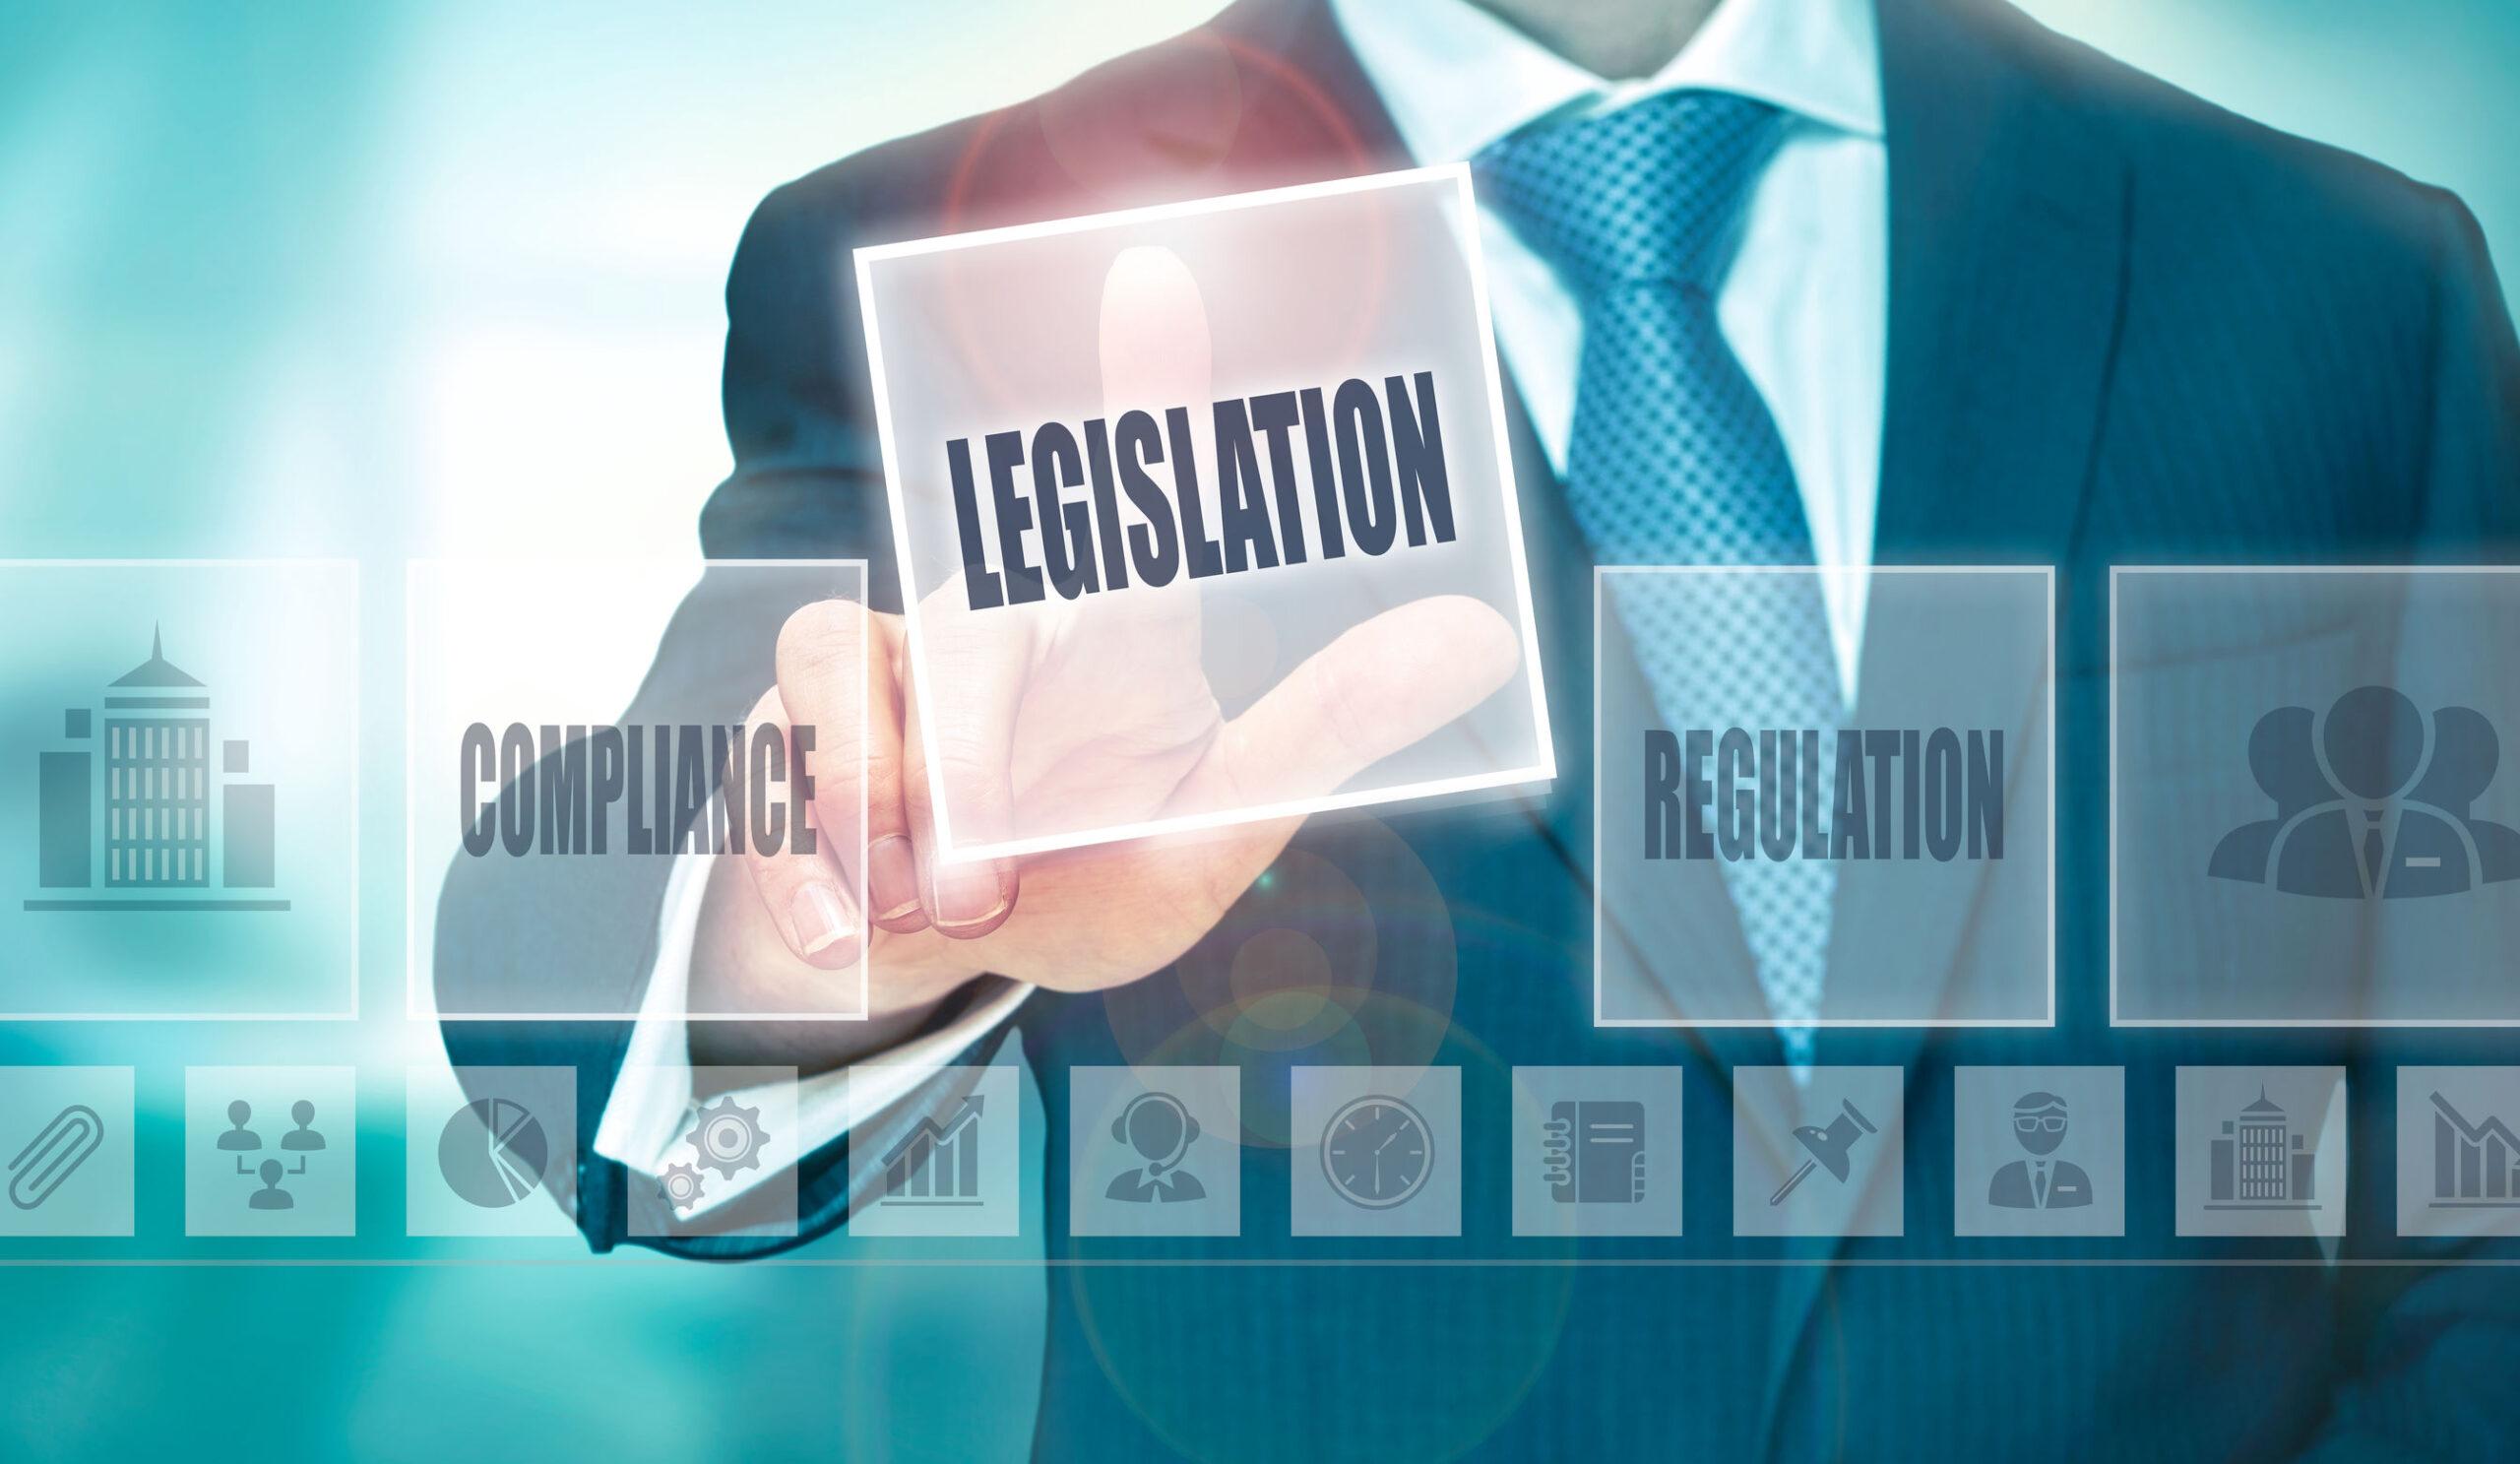 A Dozen-Plus Cannabis Bills Pre-filed by Texas Lawmakers